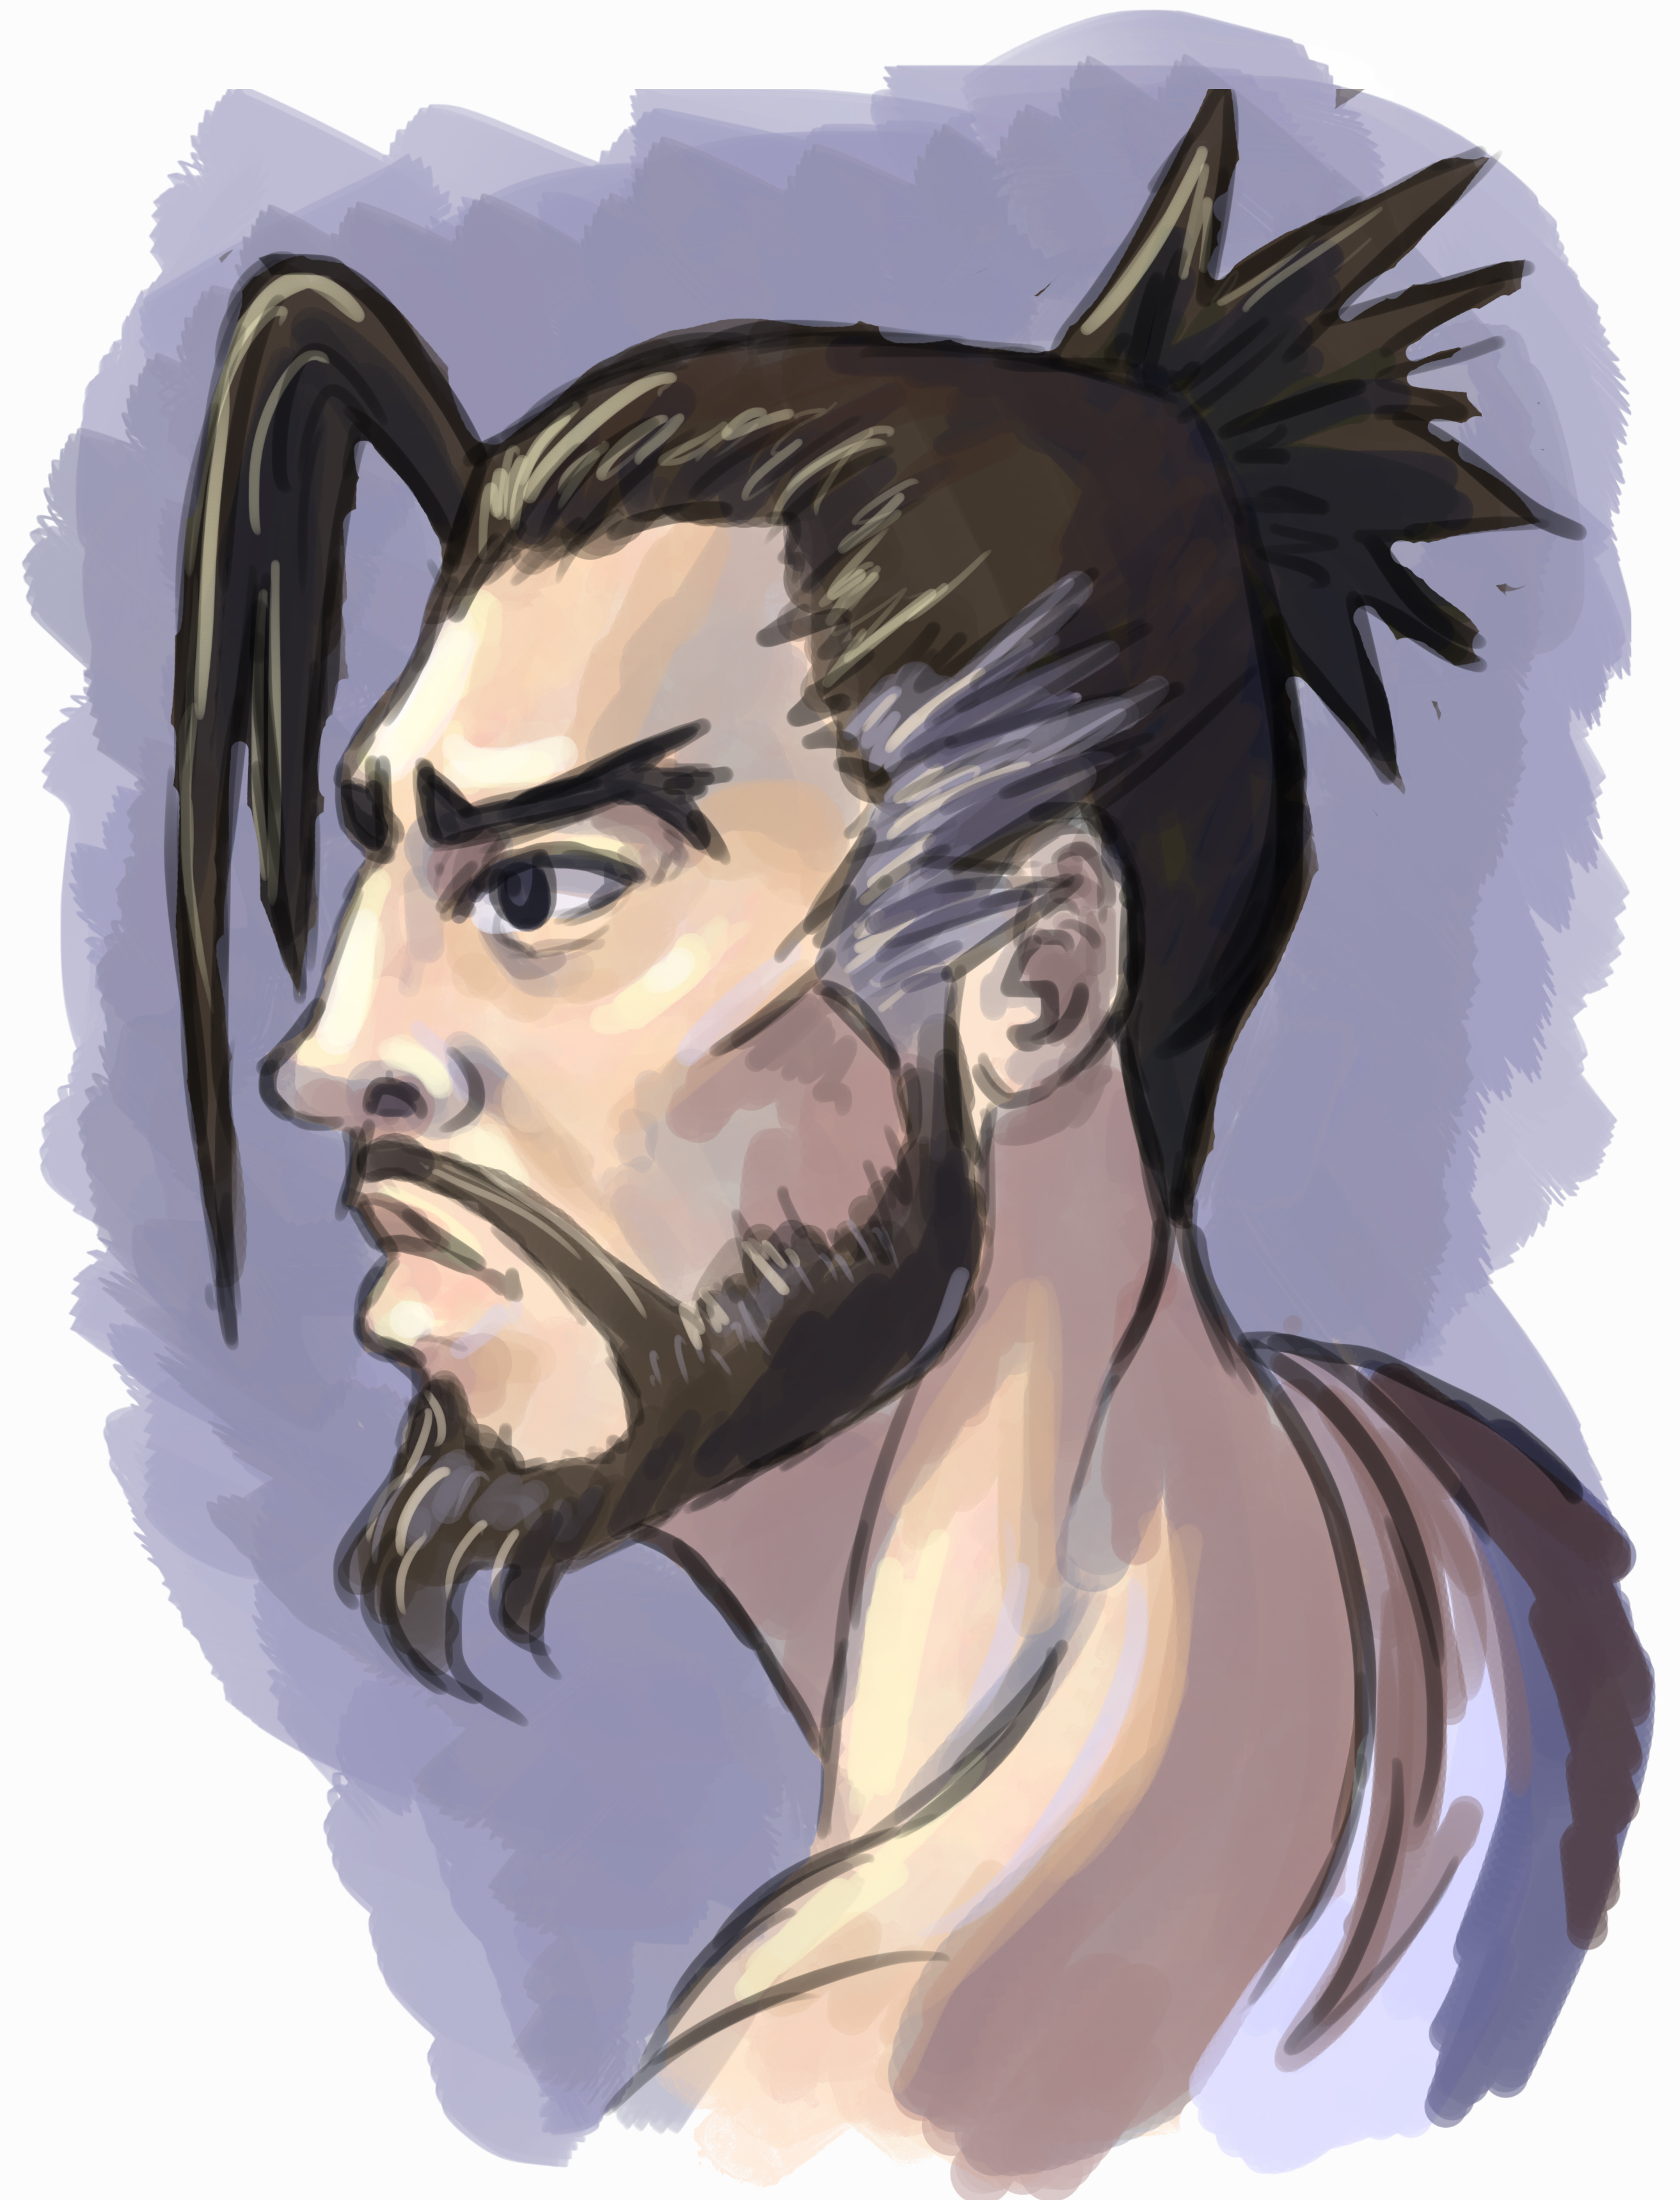 Hanzo OverWatch (Profile)